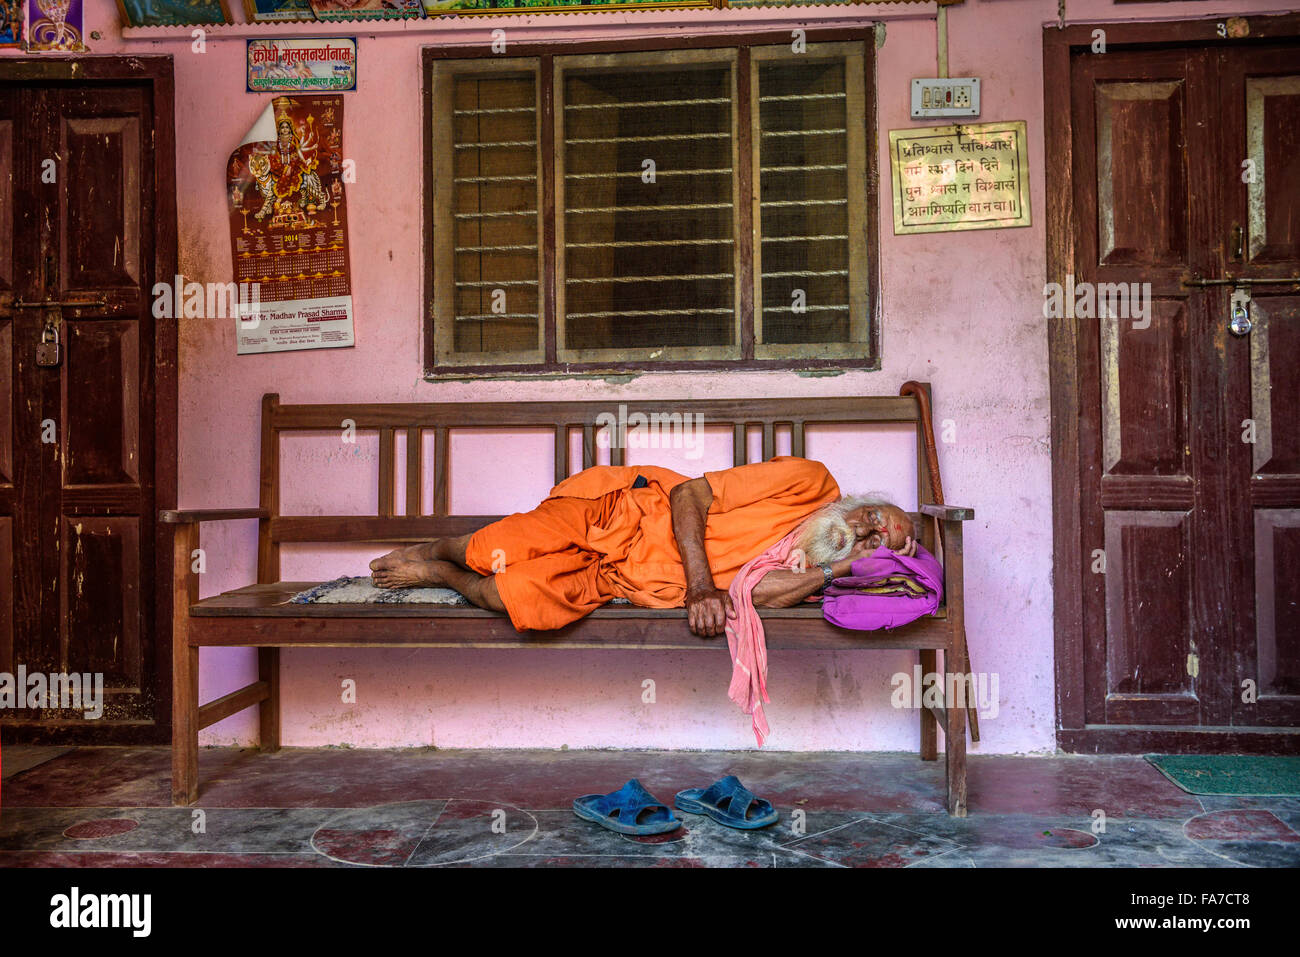 Old sadhu baba (holy man) sleeping on a bench - Stock Image